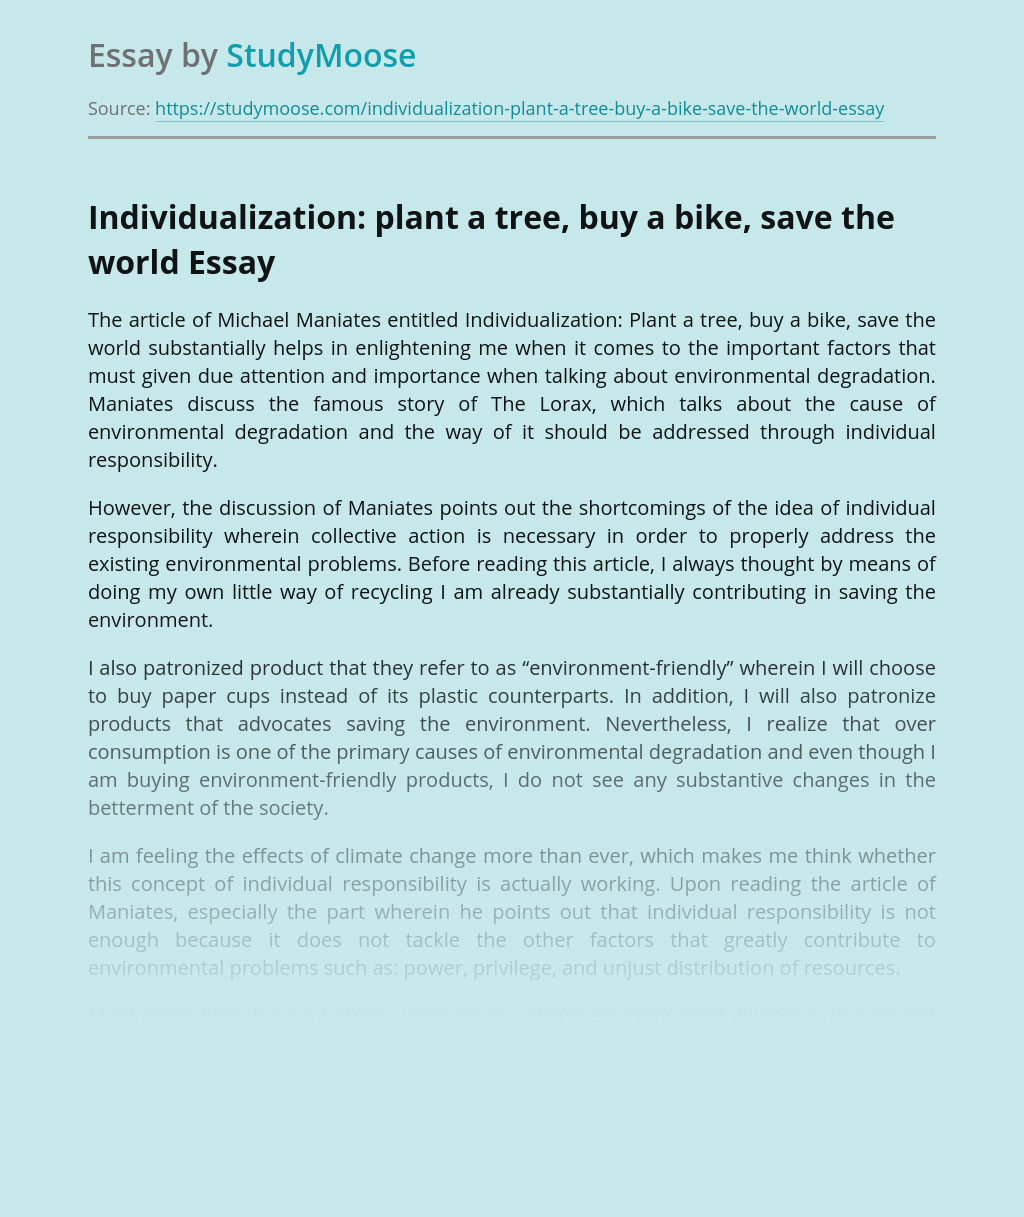 Individualization: plant a tree, buy a bike, save the world